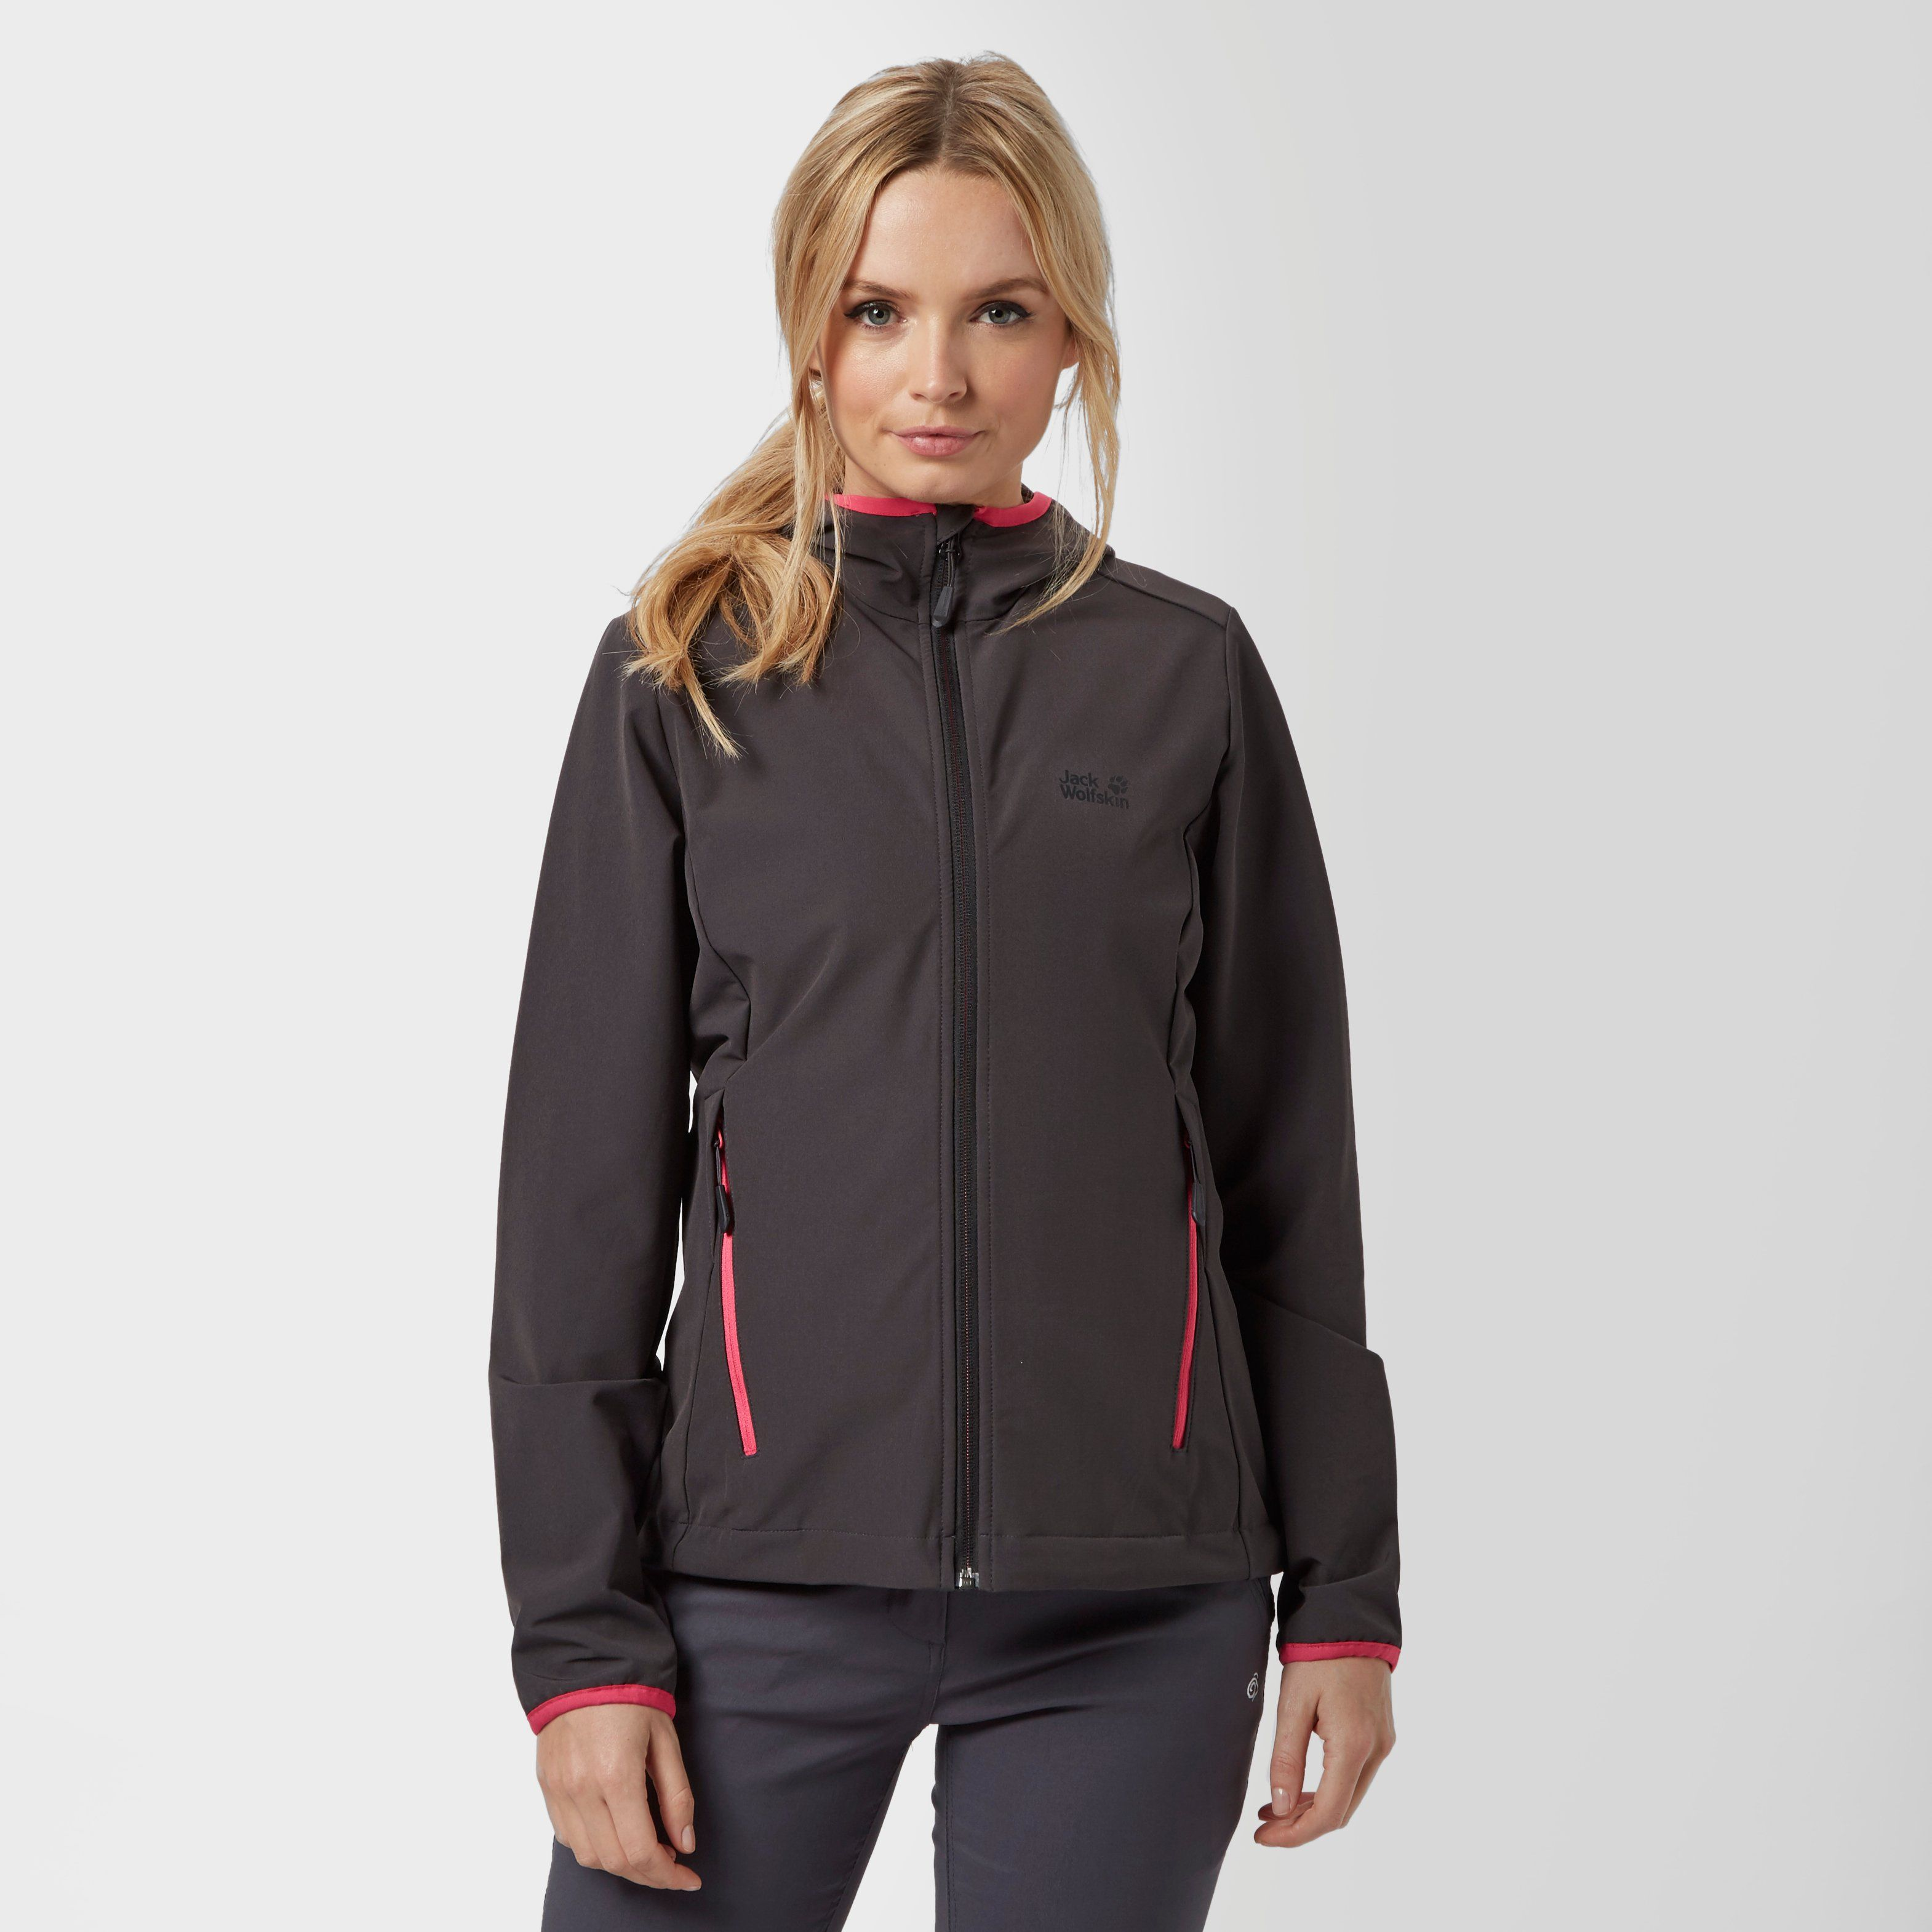 JACK WOLFSKIN Women's Turbulence Softshell Jacket